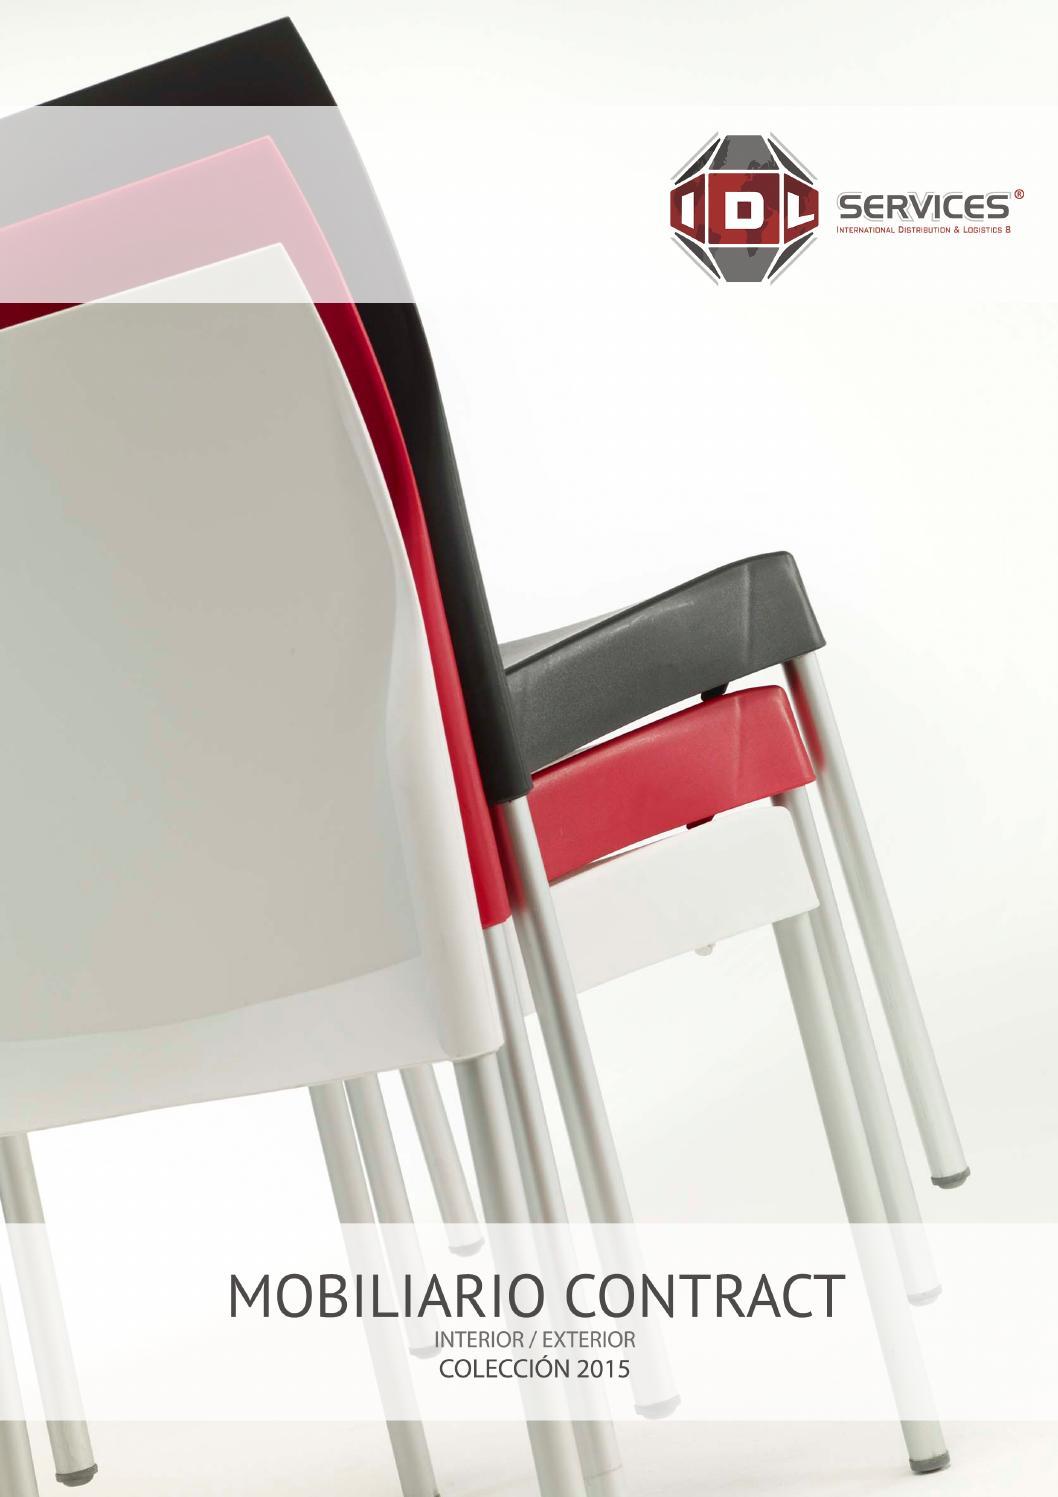 Idl services mobiliario contract by juan aaron santana for Mobiliario b ru